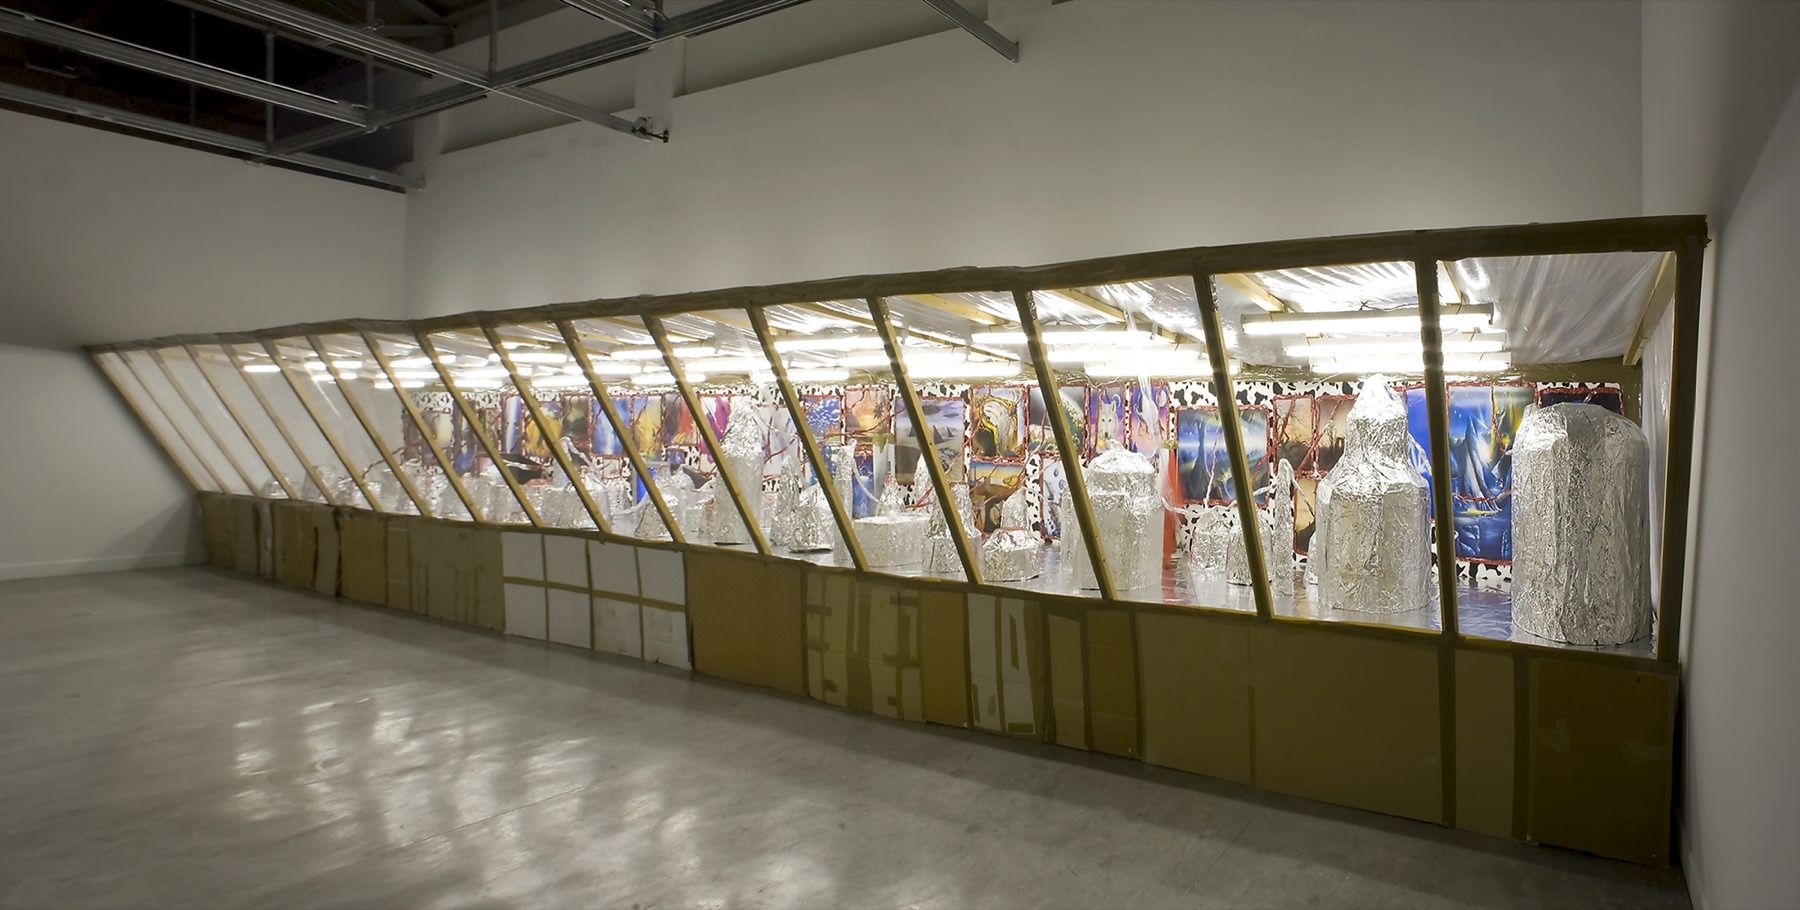 Thomas Hirschhorn, Diorama, 1997